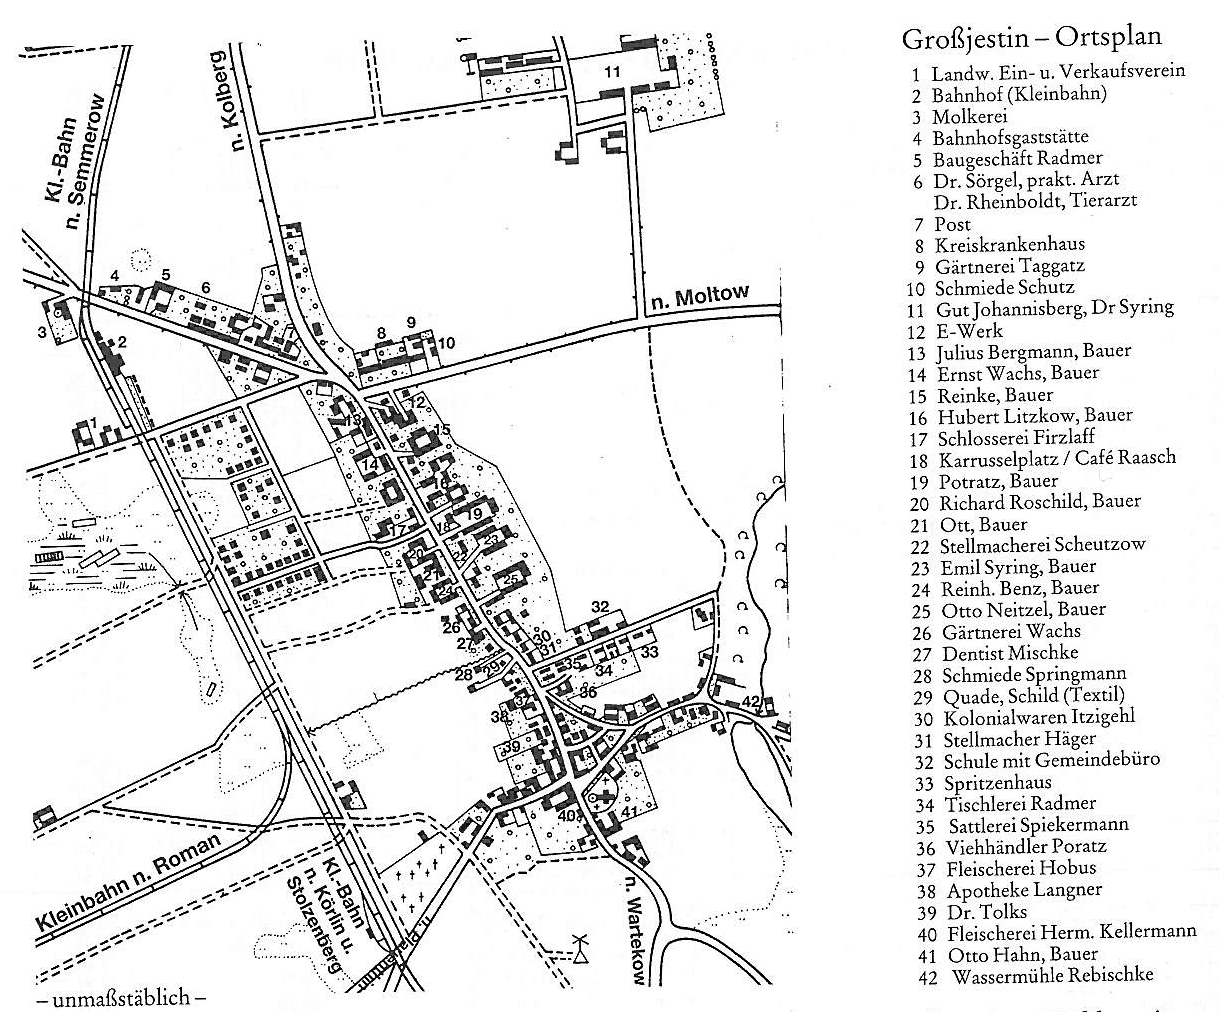 GroßjestinMap